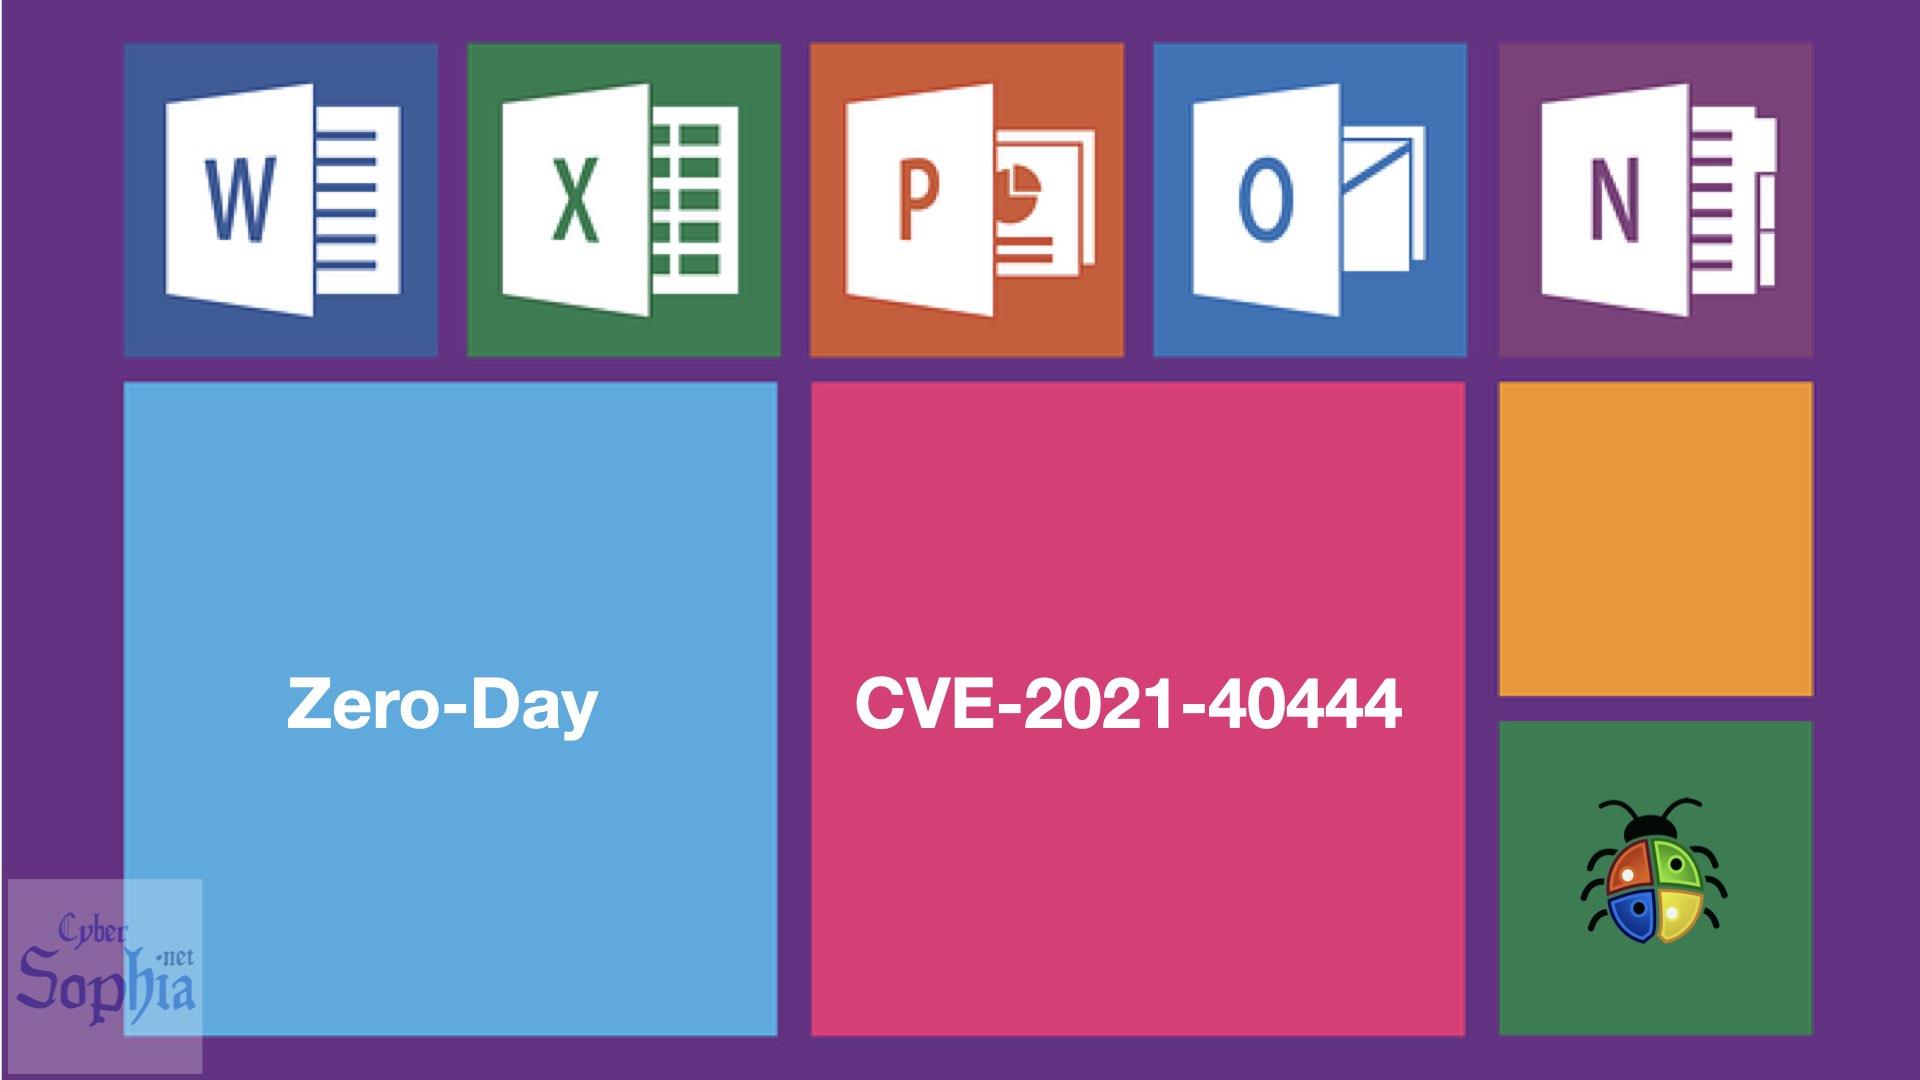 Zero-Day Vulnerability in MSHTML (CVE-2021-40444) - Cyber Sophia